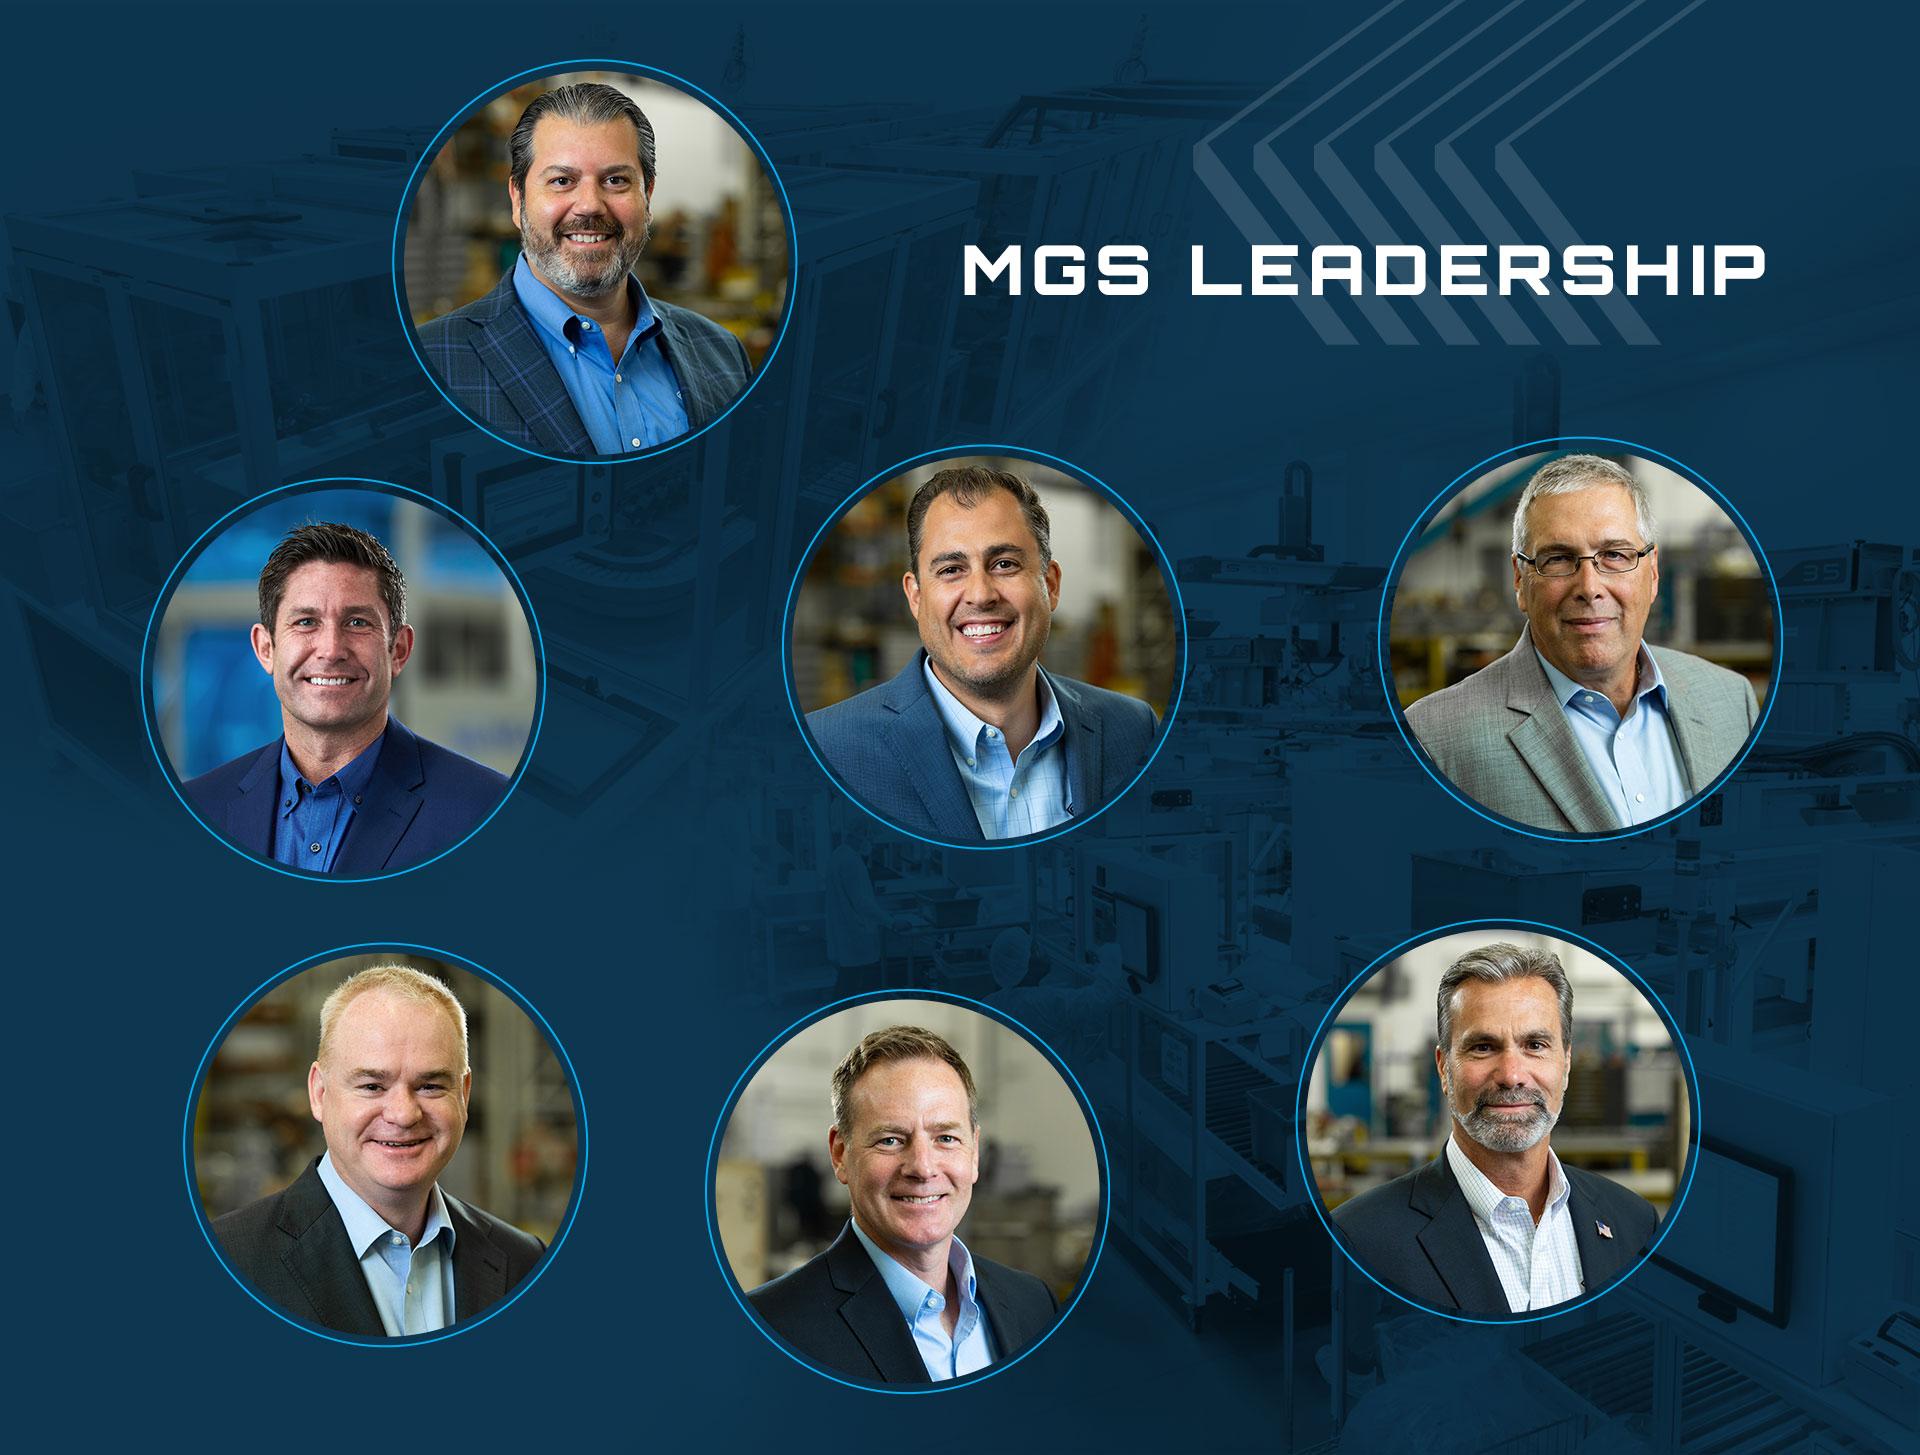 MGS Leadership